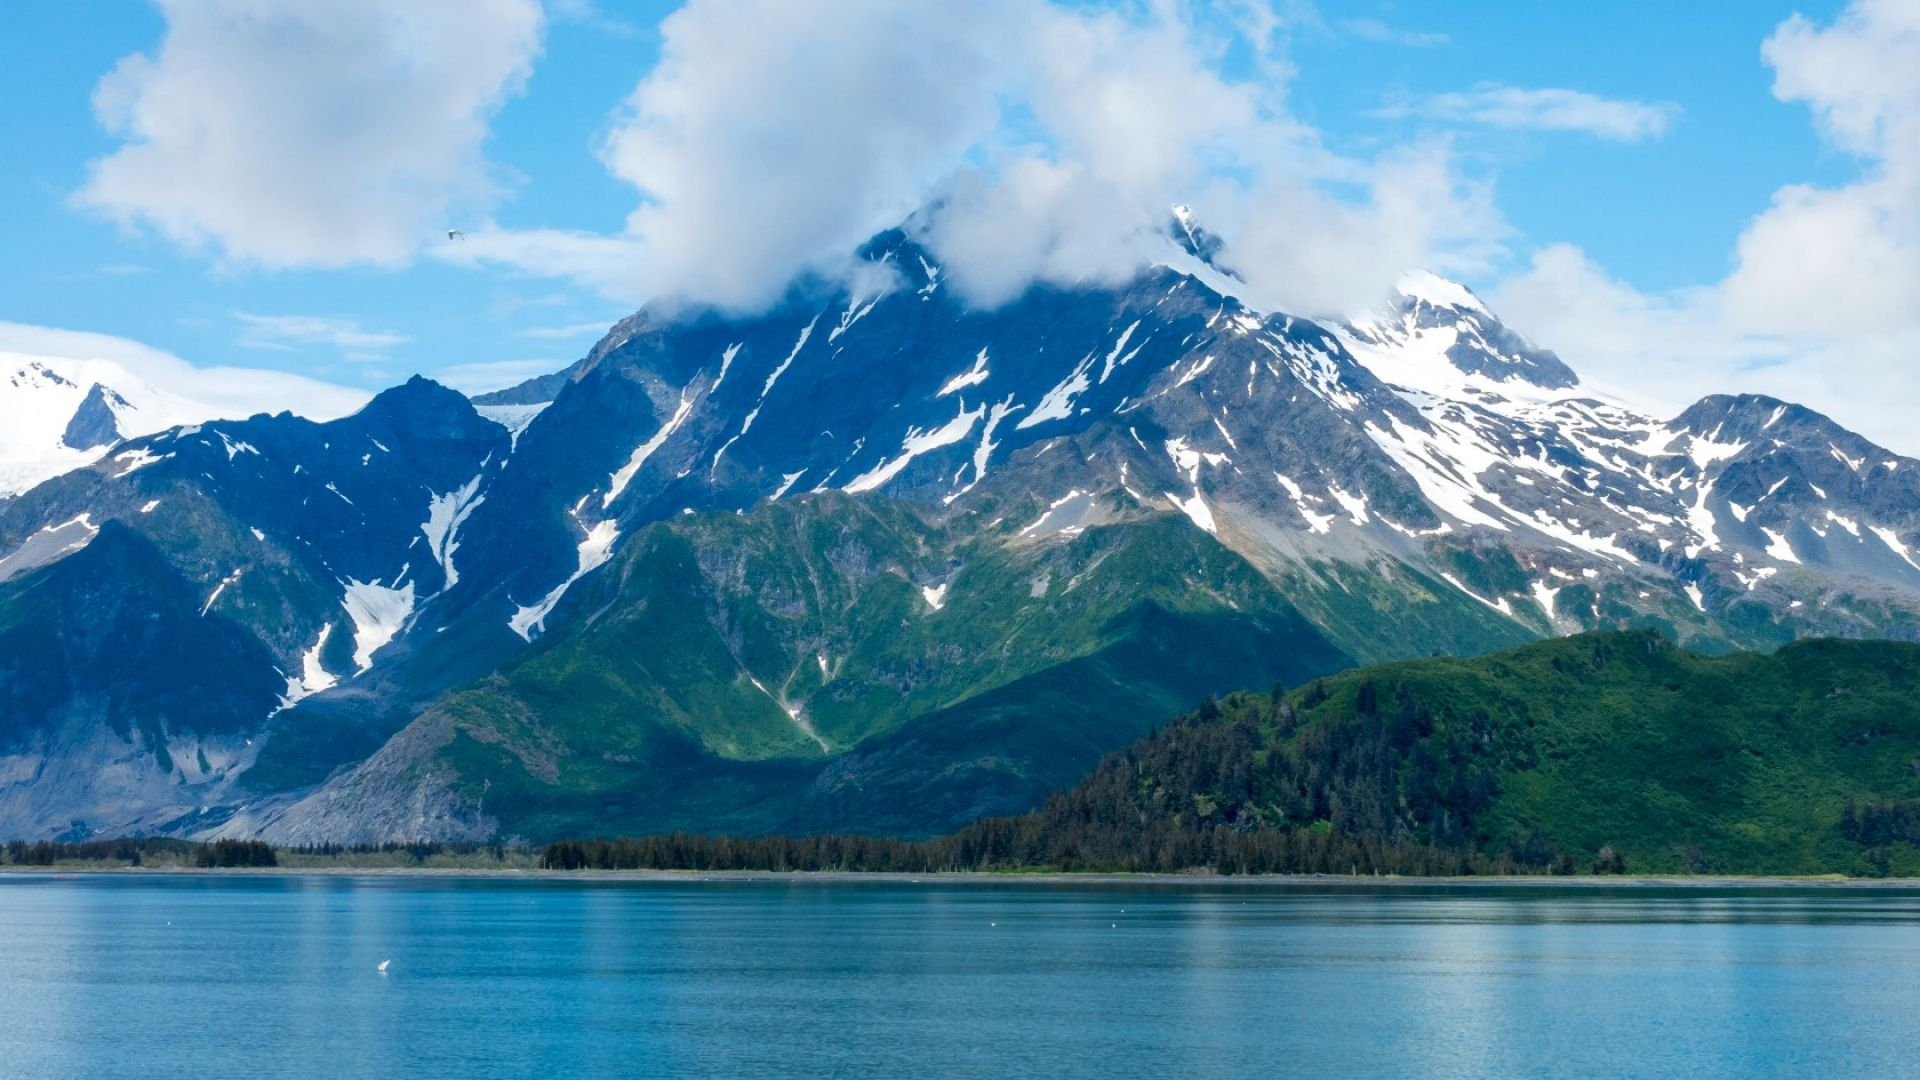 Full HD 1080p Alaska Wallpapers HD, Desktop Backgrounds 1920x1080 ...   ALASKA   Kenai fjords ...